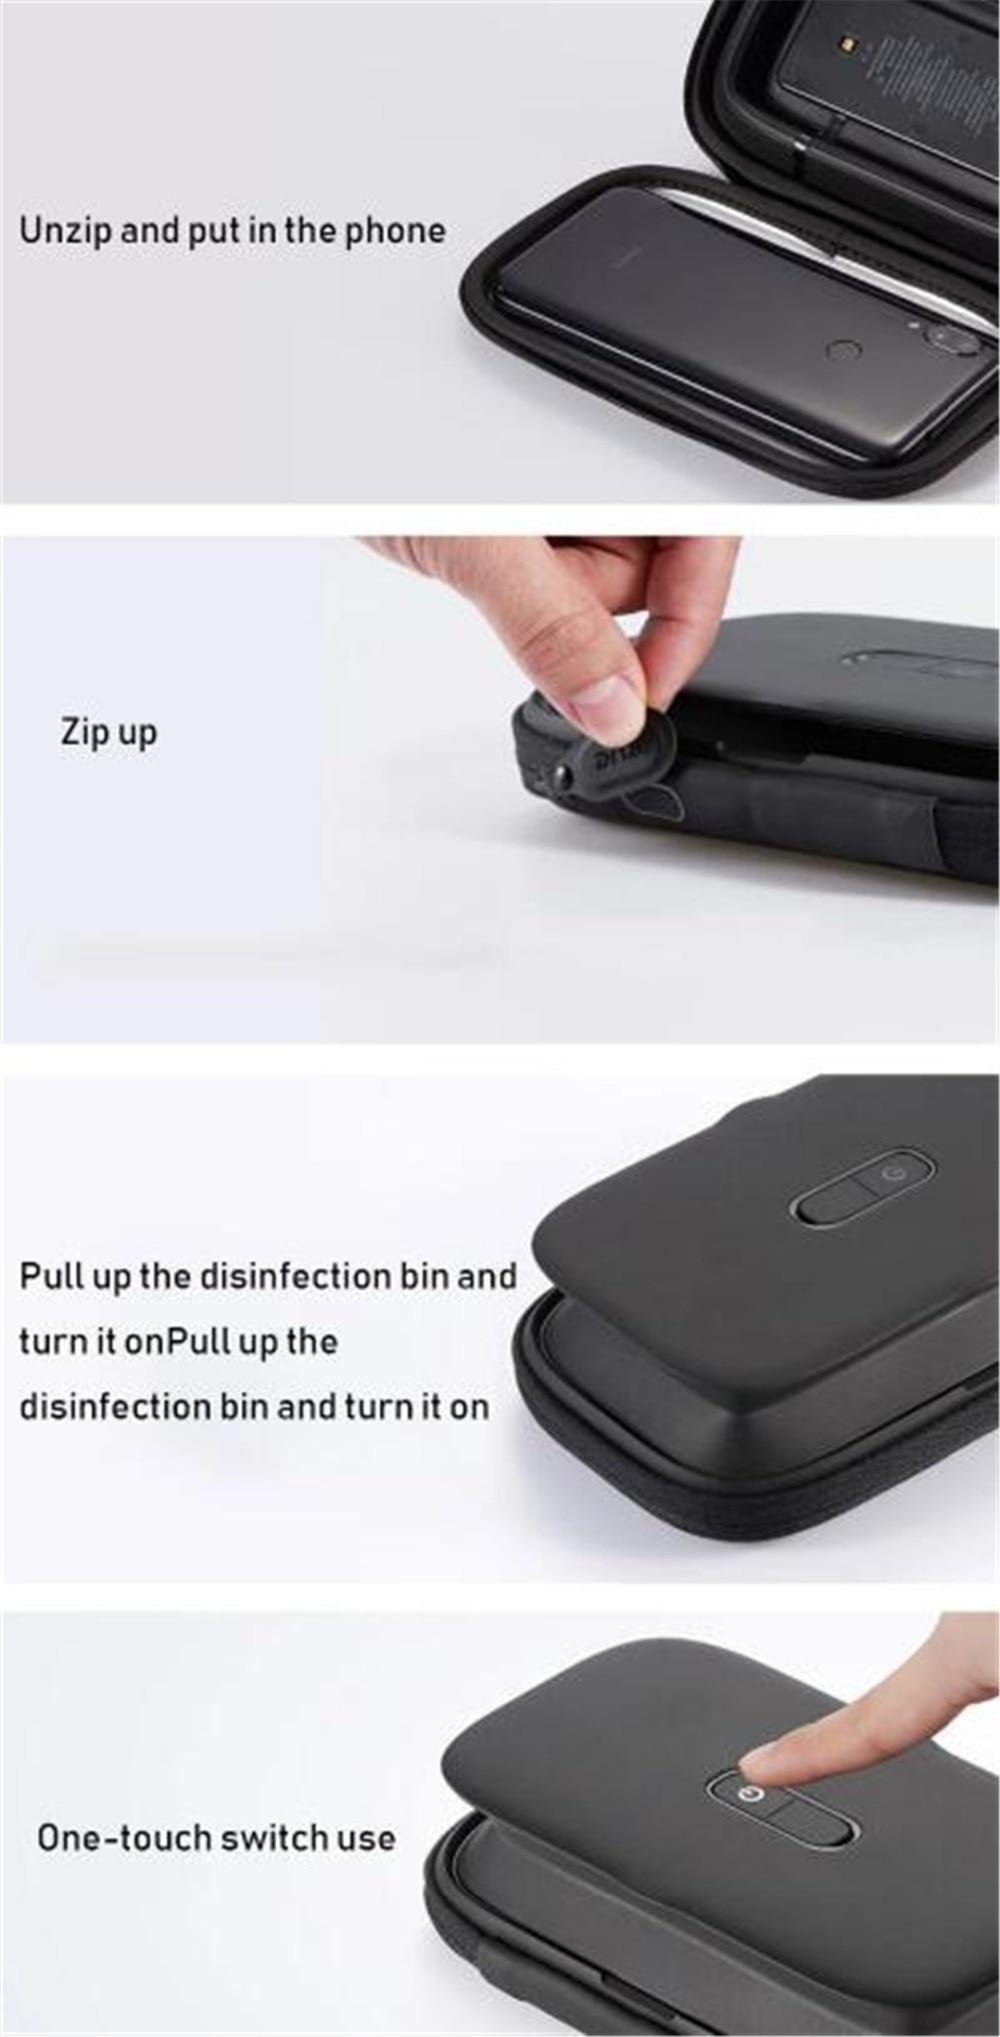 Xiaomi EUE Ultraviolet sterilization package for mobile phonessmall item UV Germicidal Portable Sterilization Bag Disinfection (6)